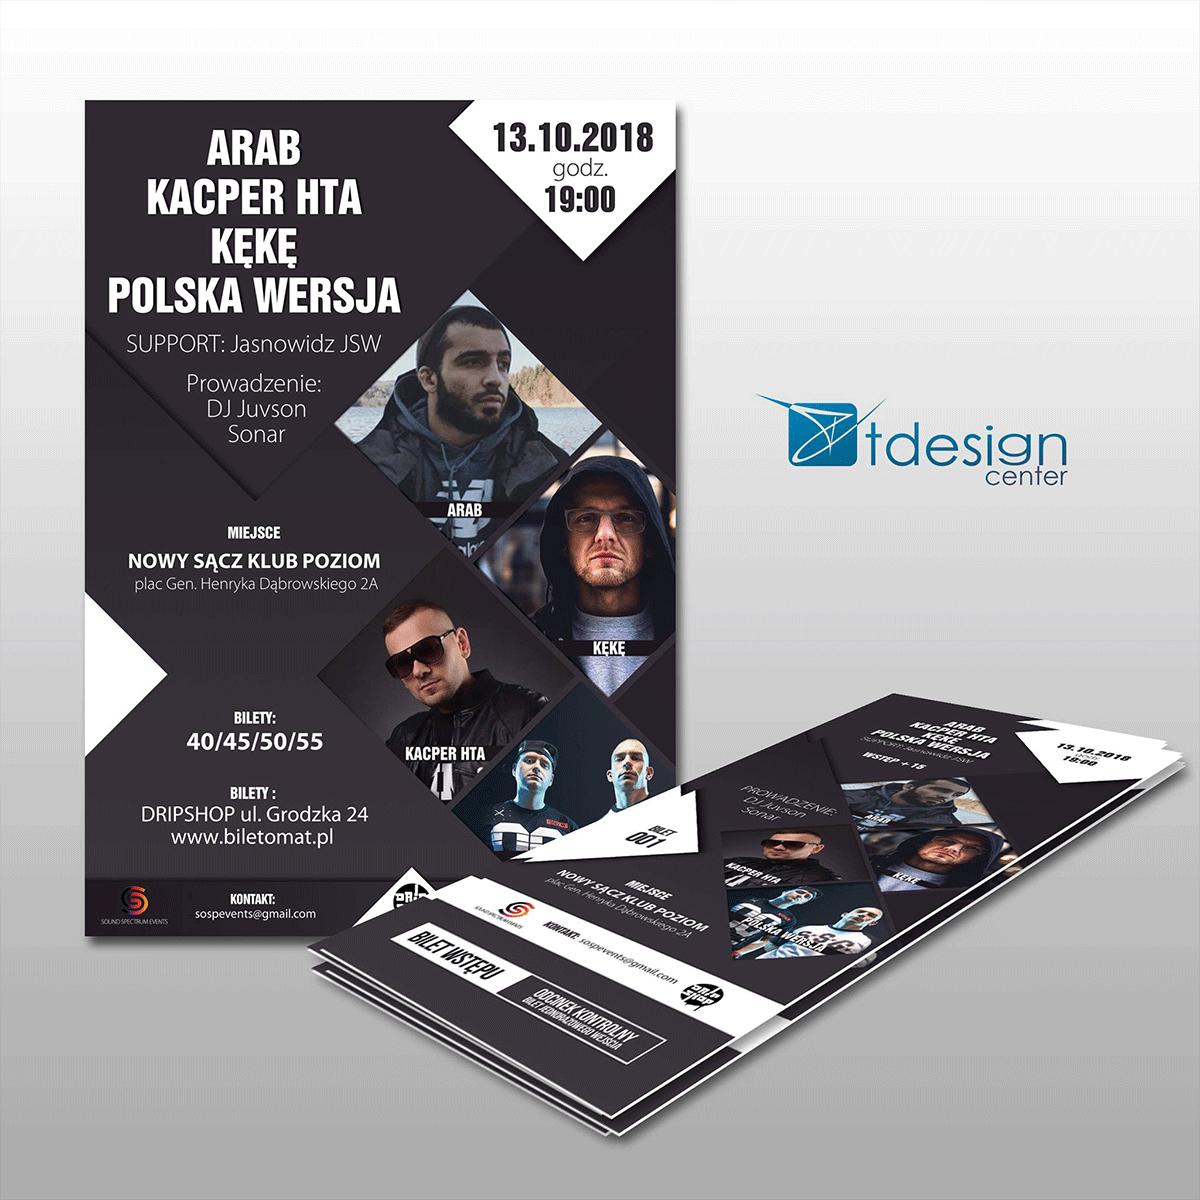 Plakaty A3 oraz bilety 7x15cm, projekt + druk